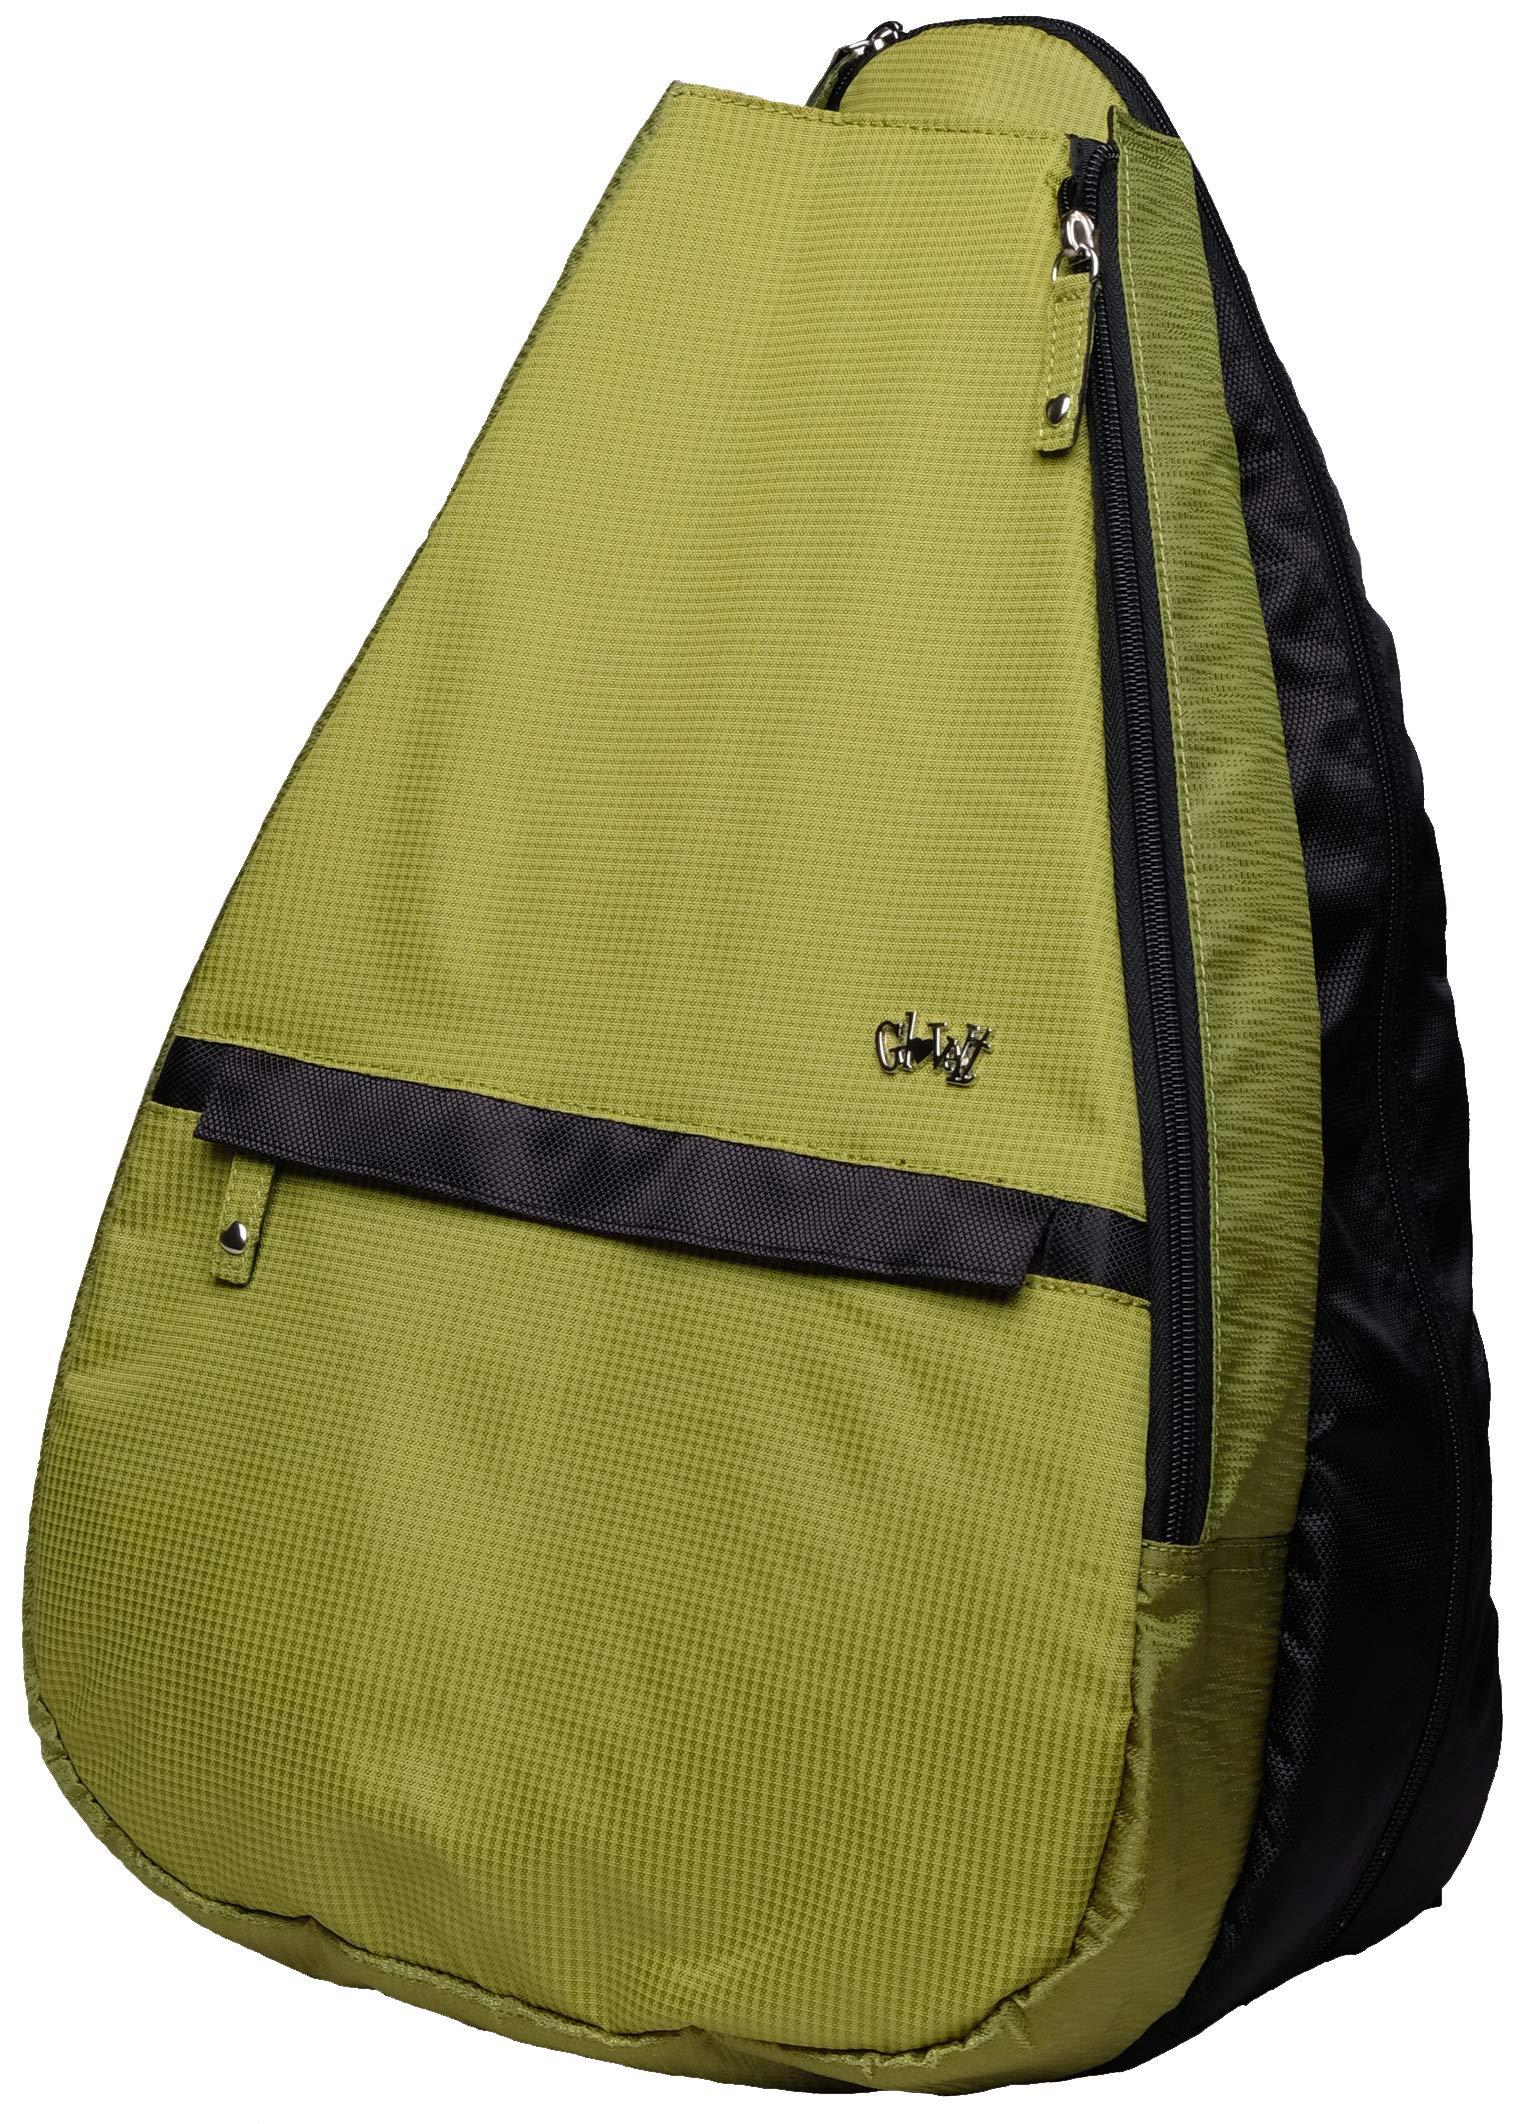 GloveIt Womens Tennis Backpack Backpacks